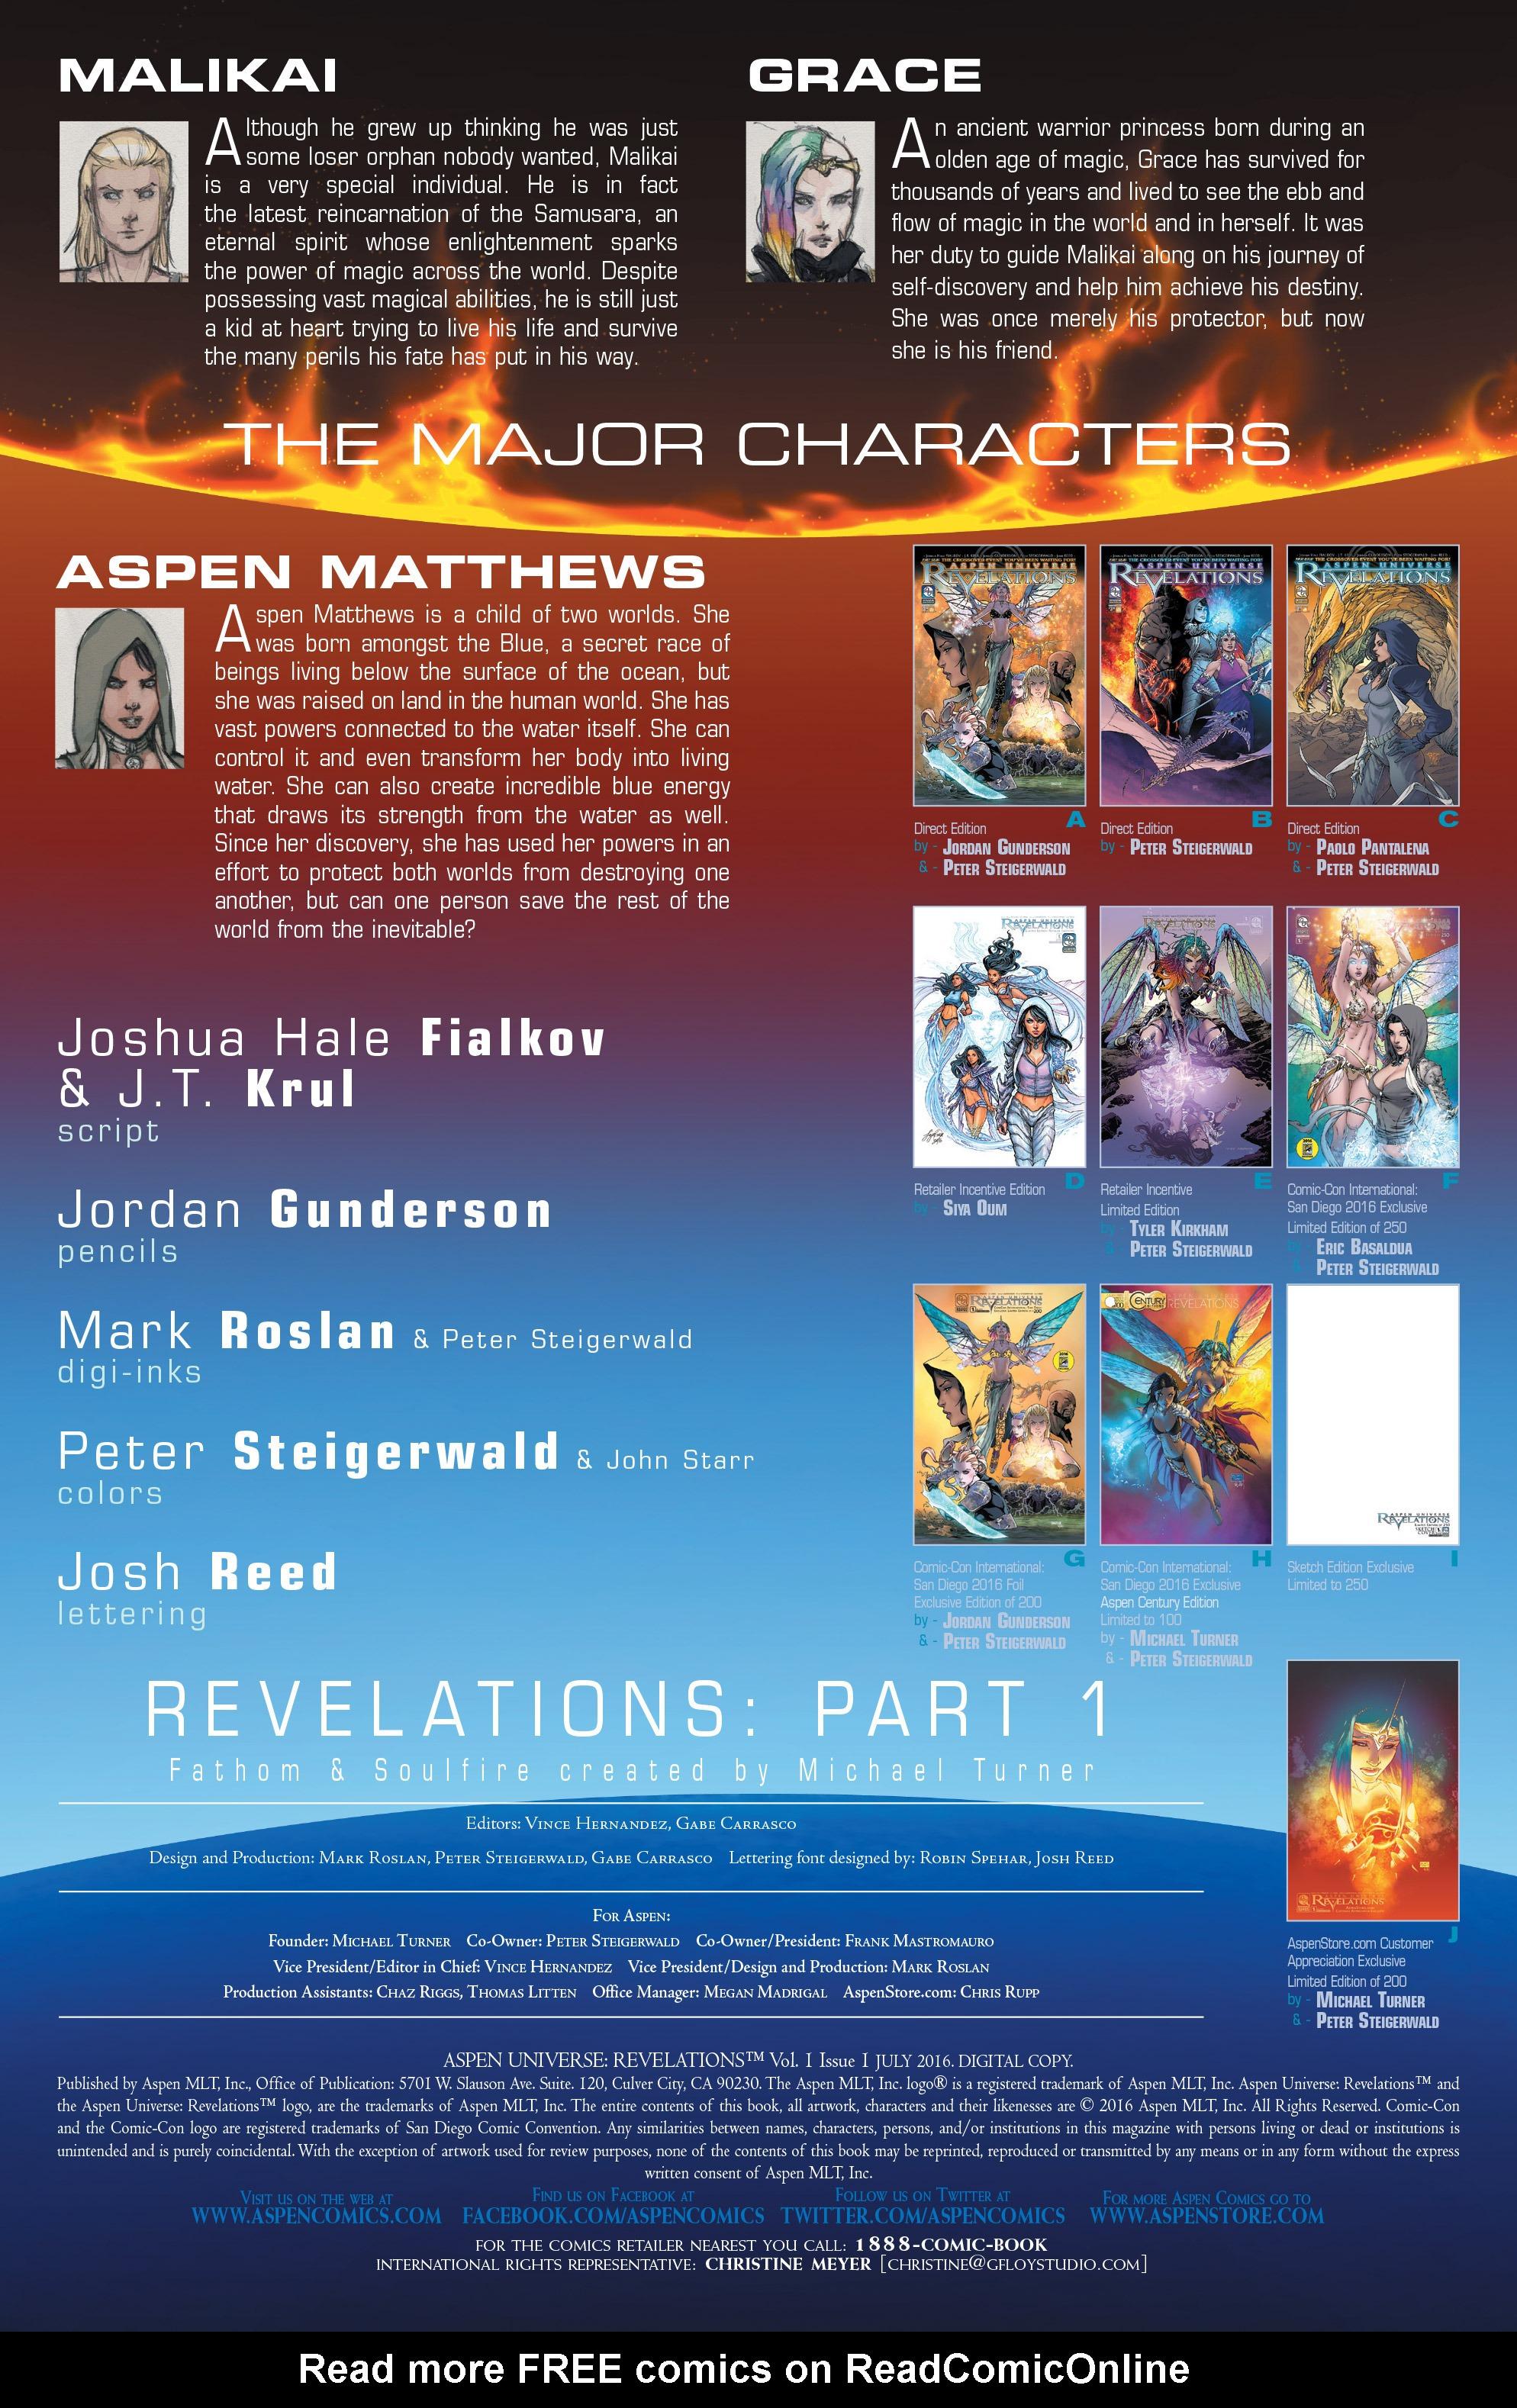 Read online Aspen Universe: Revelations comic -  Issue #1 - 4